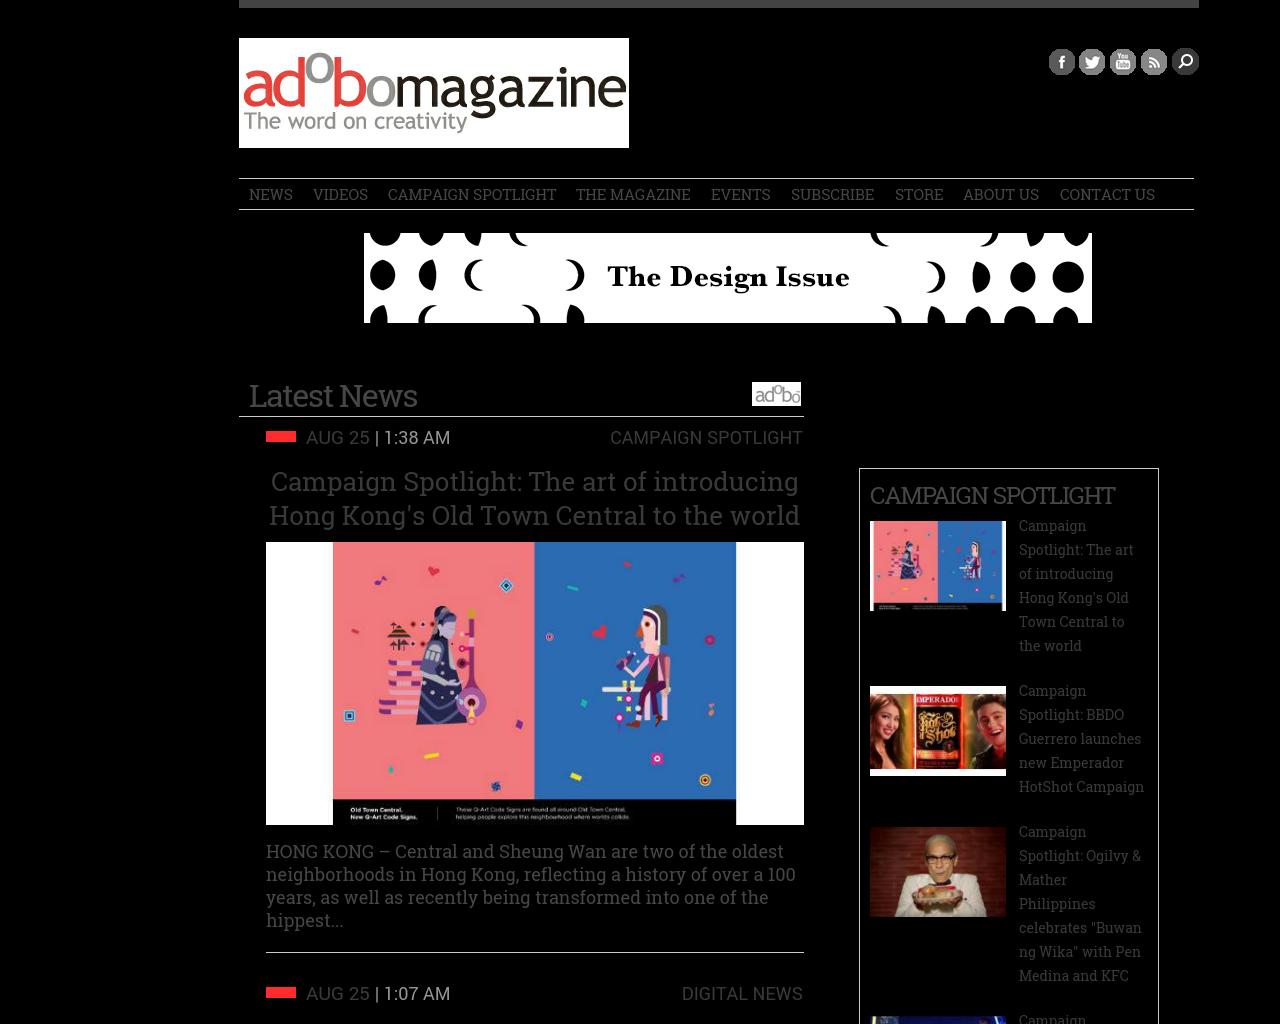 adobomagazine-Advertising-Reviews-Pricing